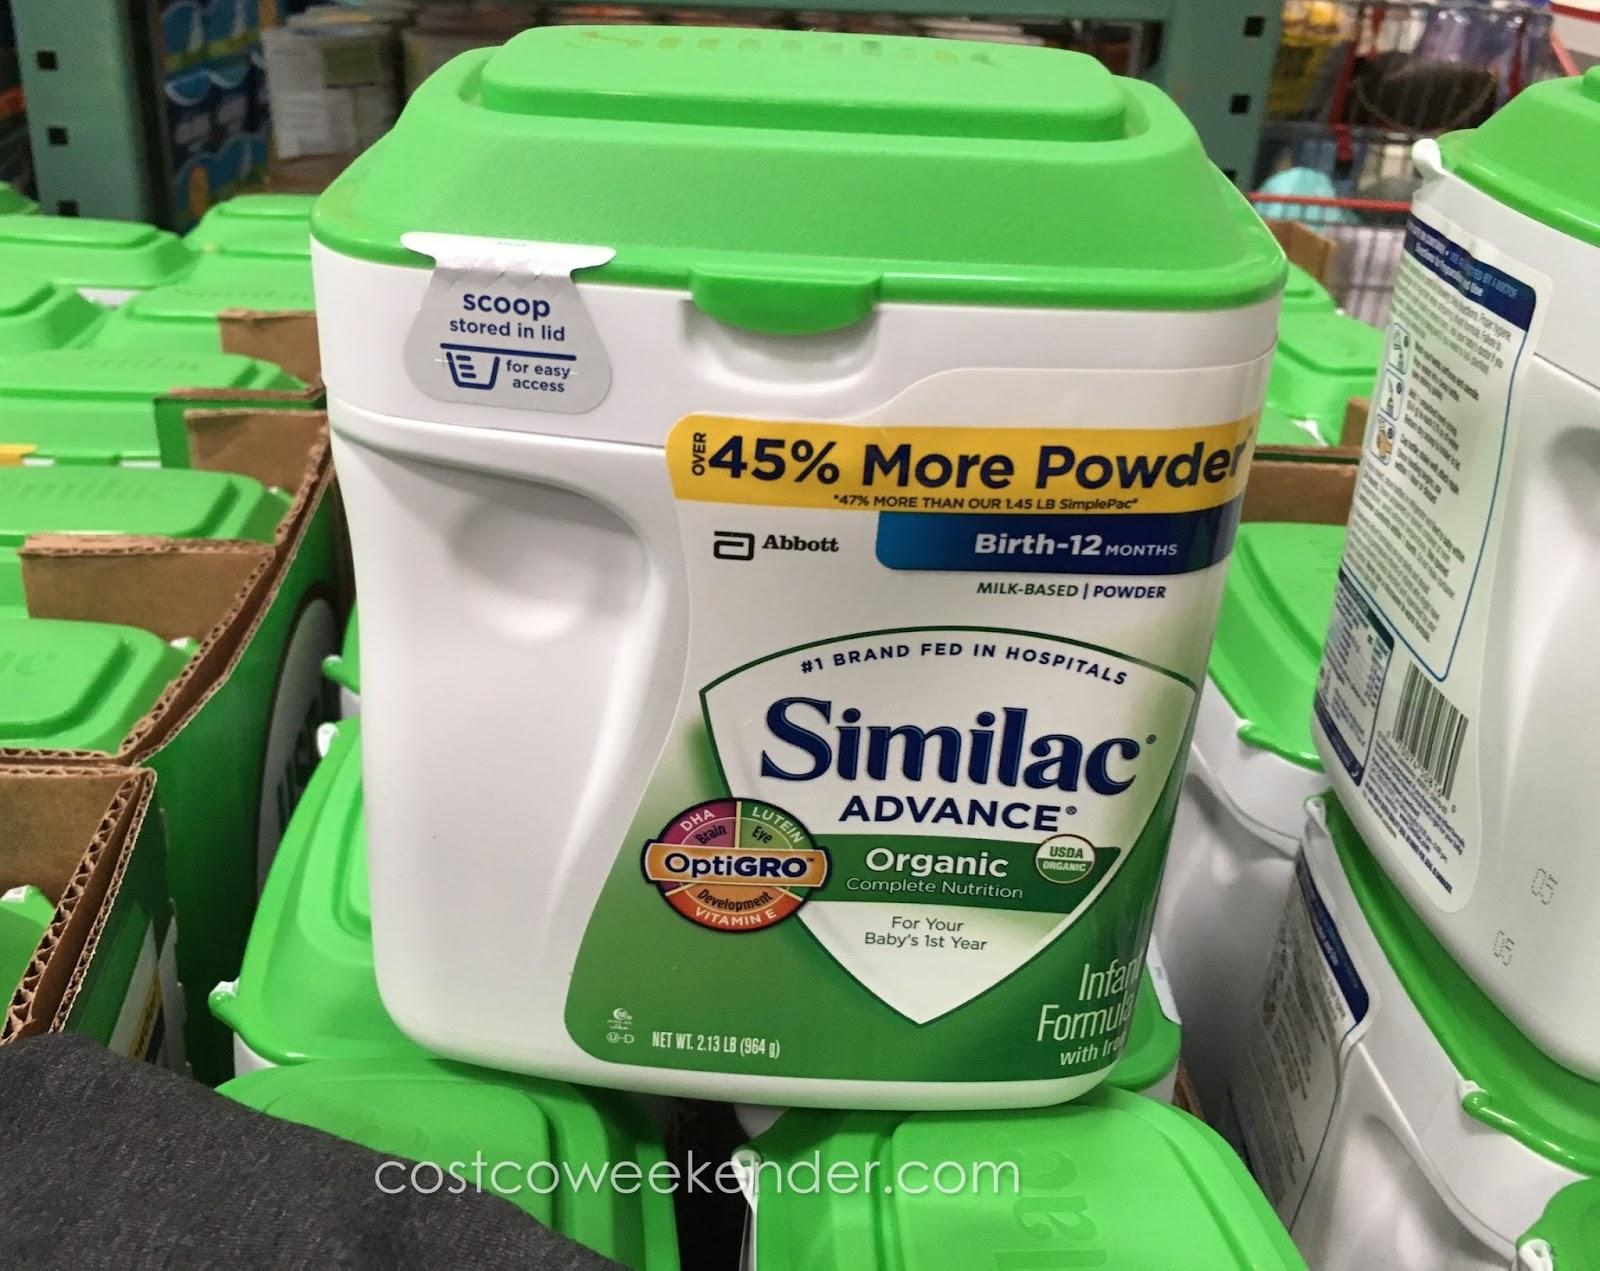 Similac Advance Organic Infant Formula Costco Weekender